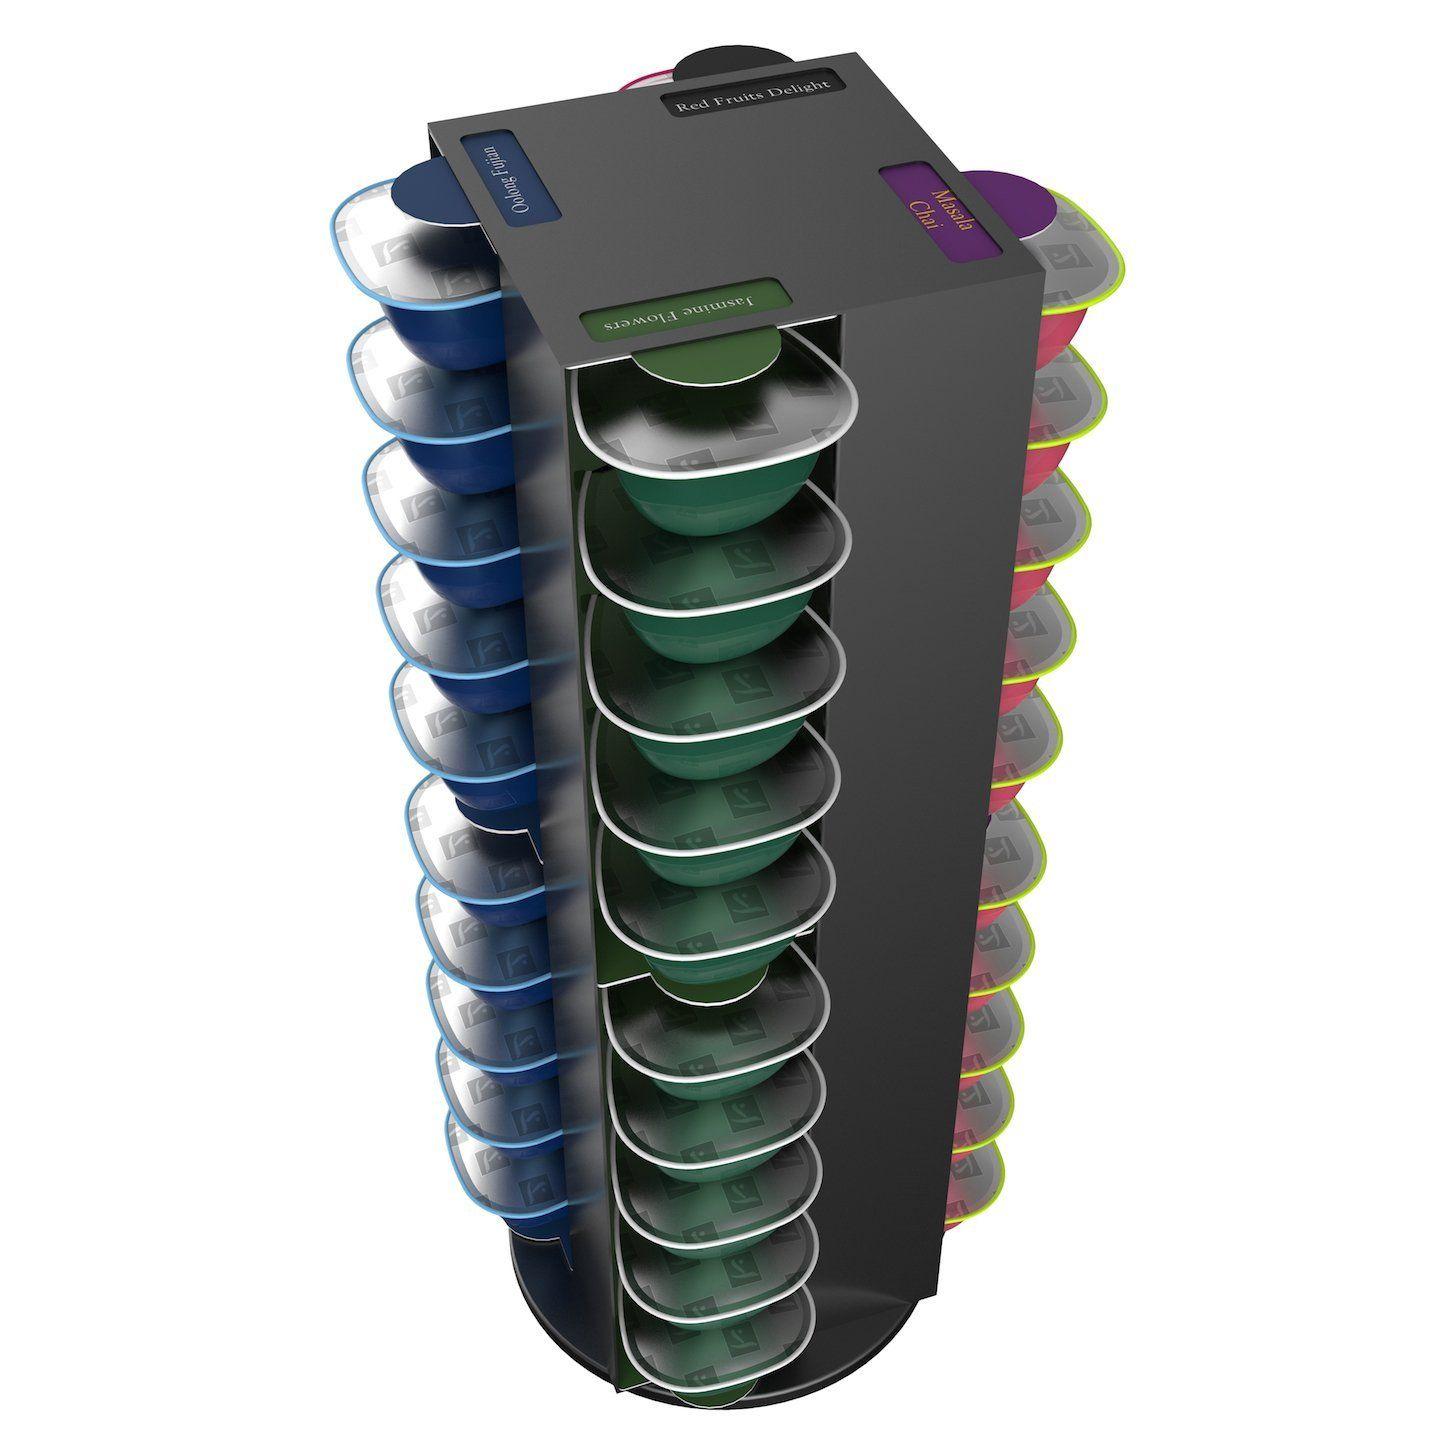 Tavolaswiss 50 Specialt Porte Capsules Special T 40 Amazon Fr Cuisine Maison Special T Capsule Acier Inoxydable